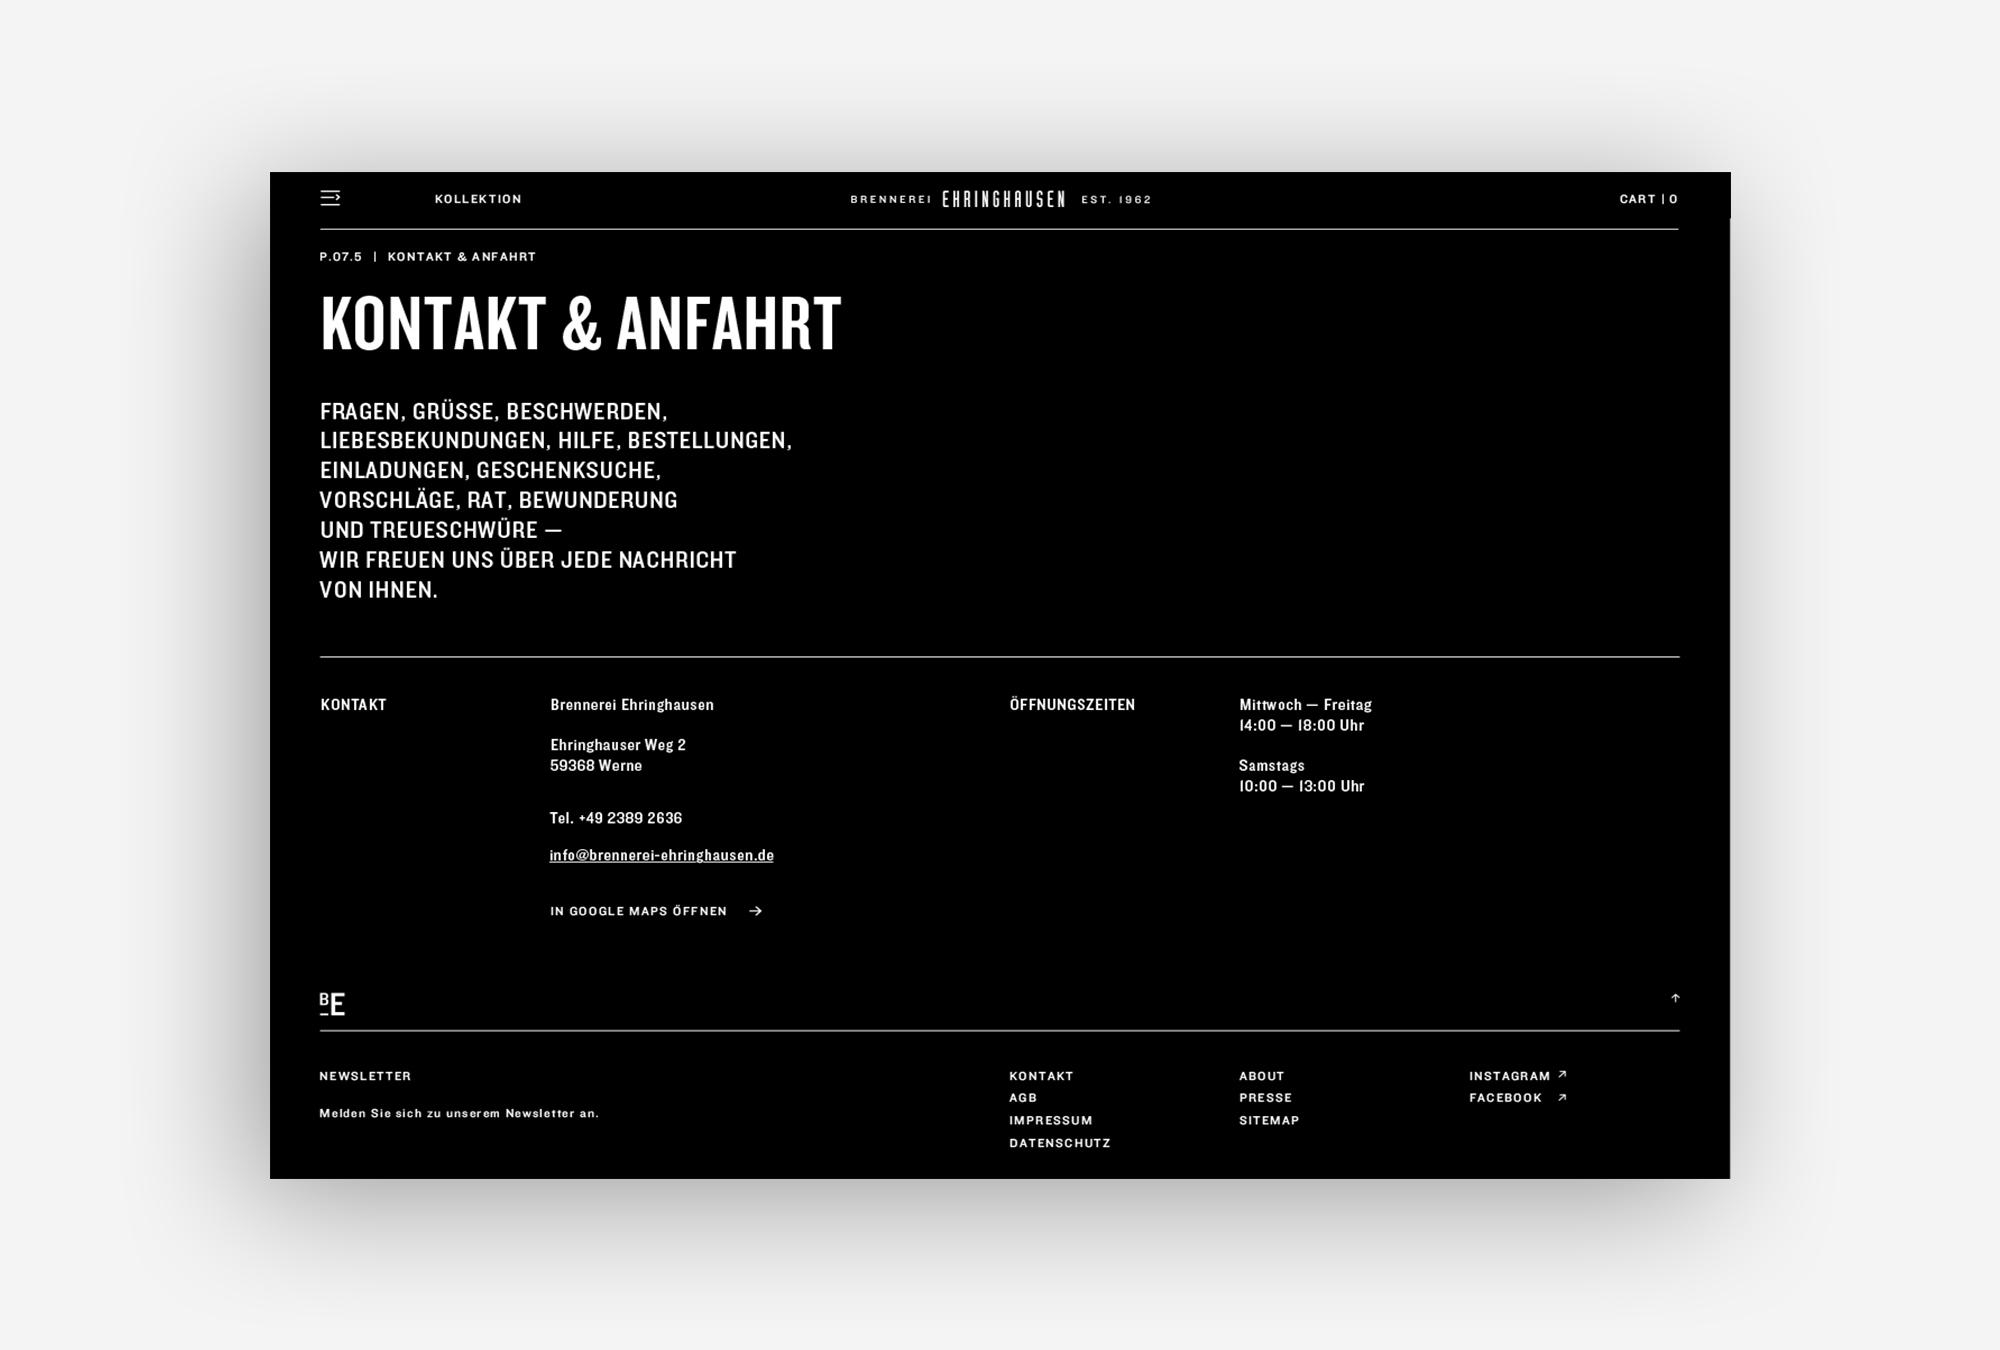 ffine-Portfolio_Brennerei-Ehringhausen_web_10.jpg